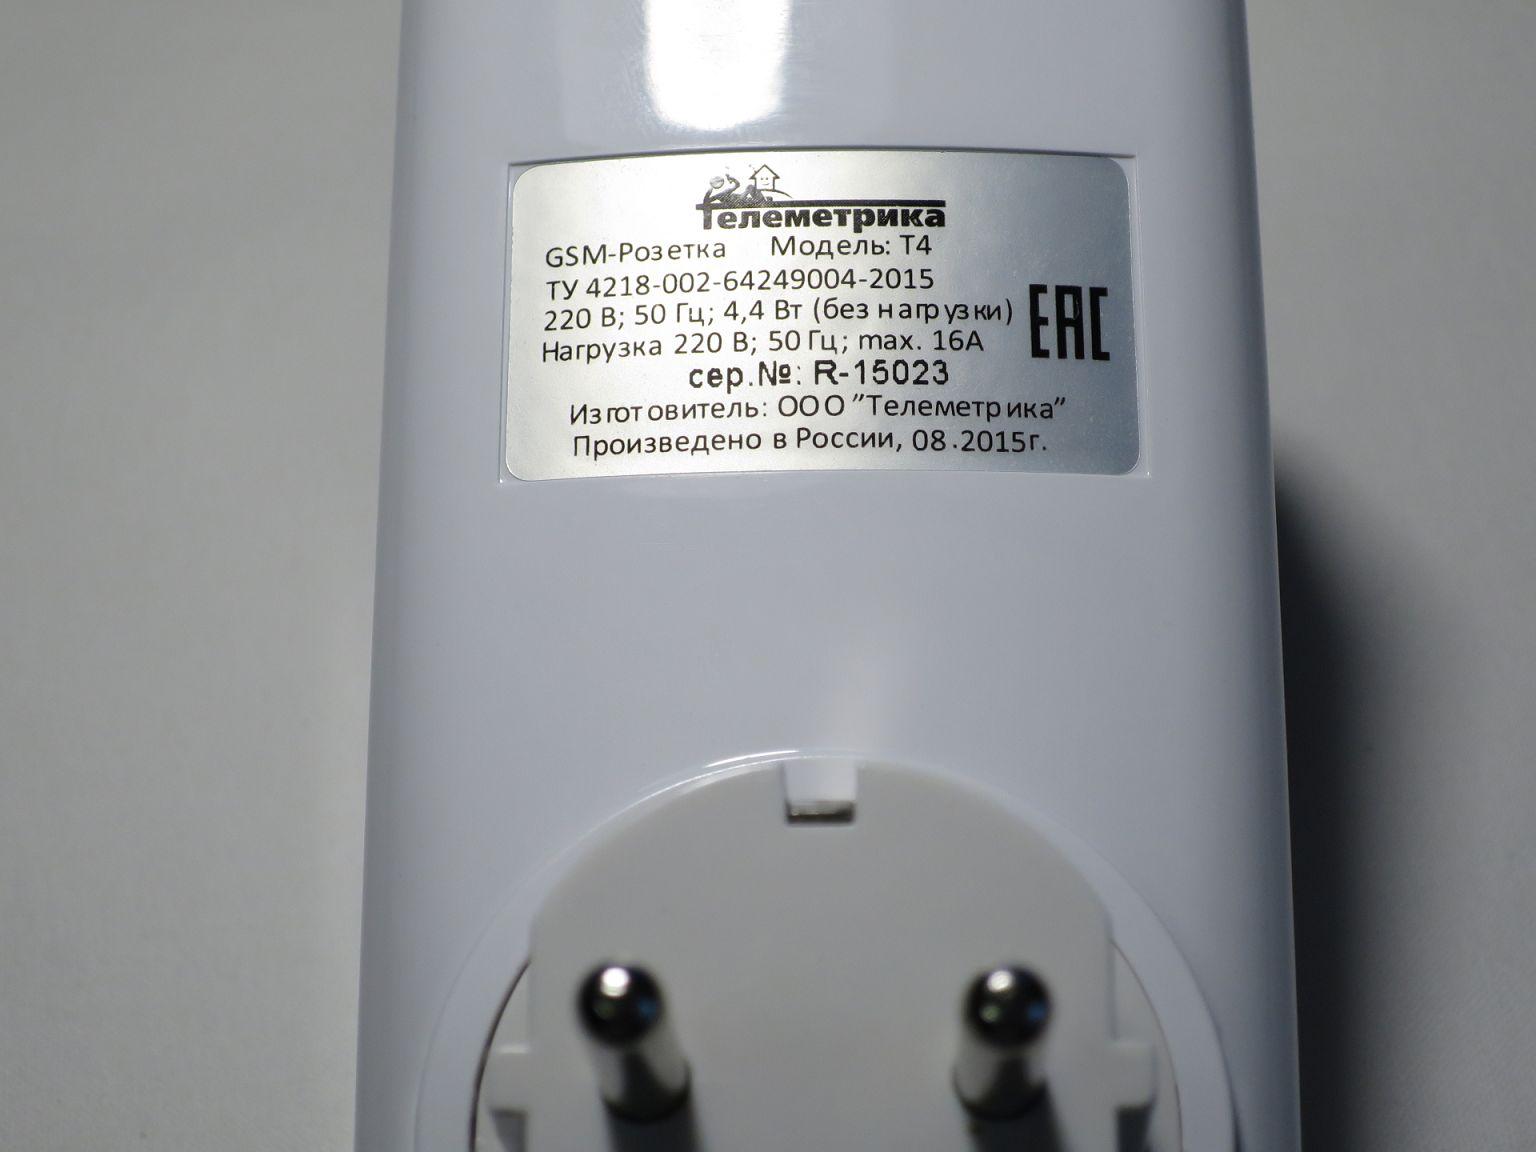 Умная GSM розетка Телеметрика. Электрические характеристики.